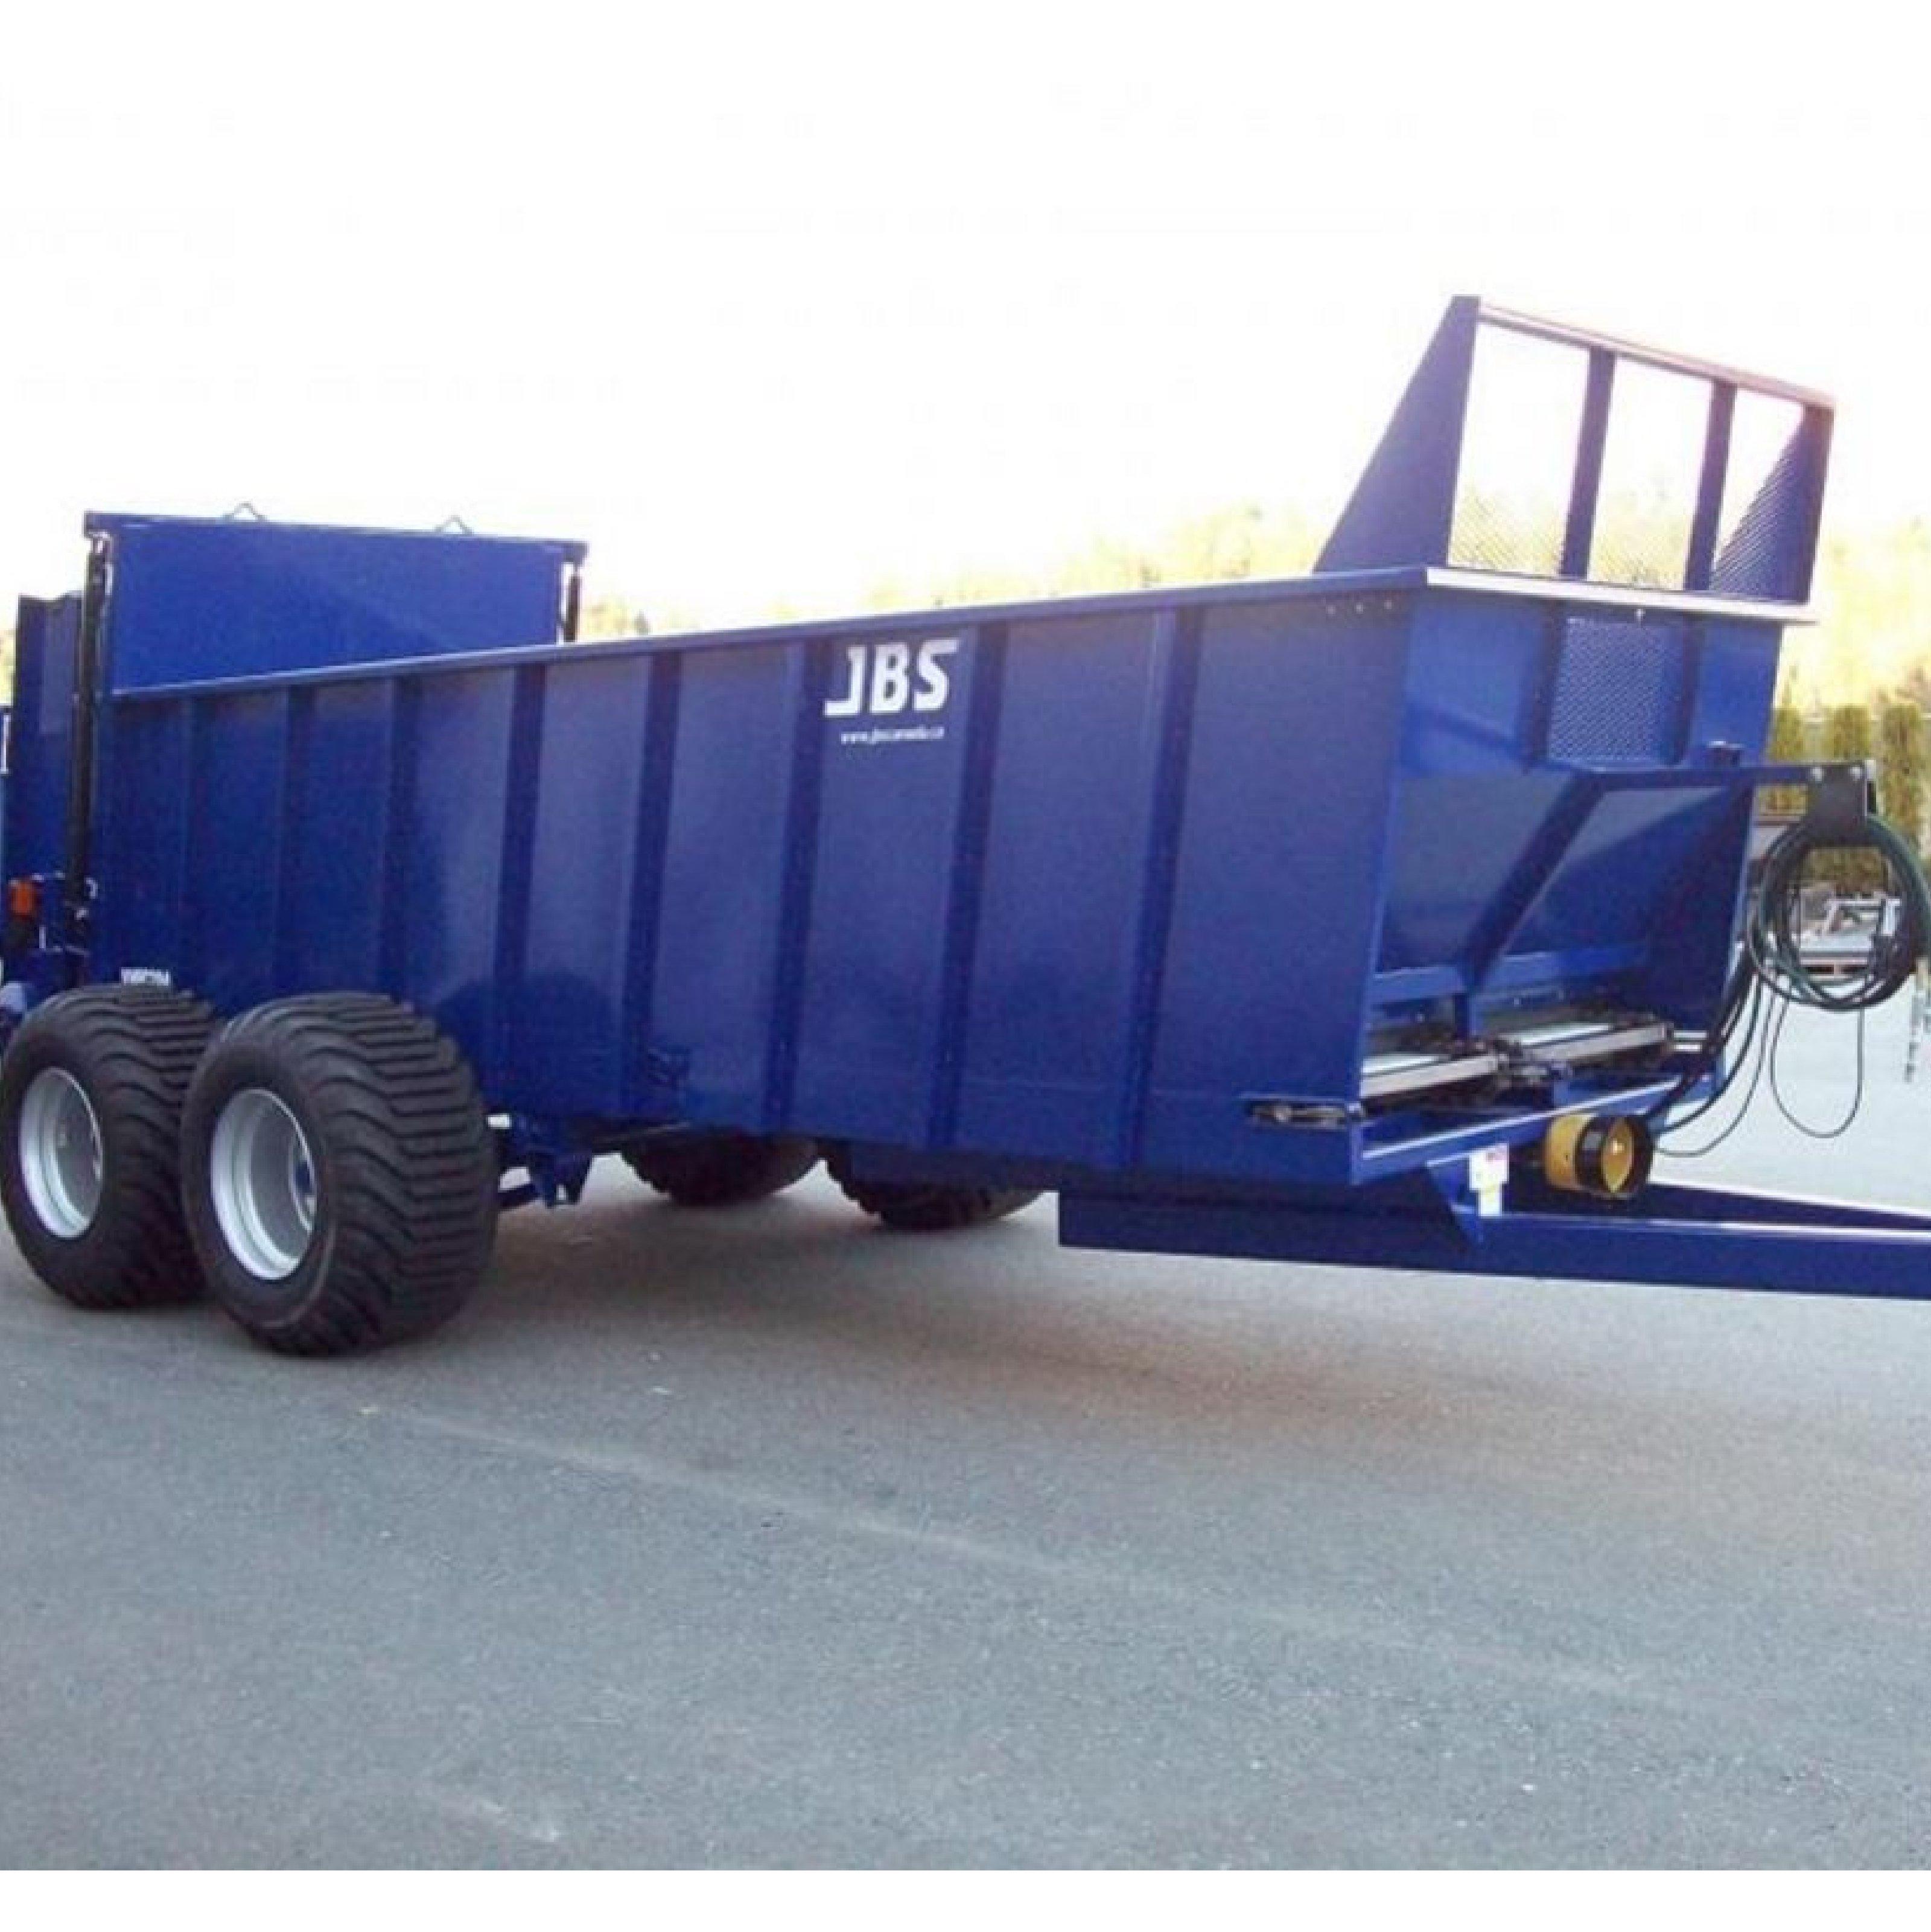 JBS Manure Spreaders Picture